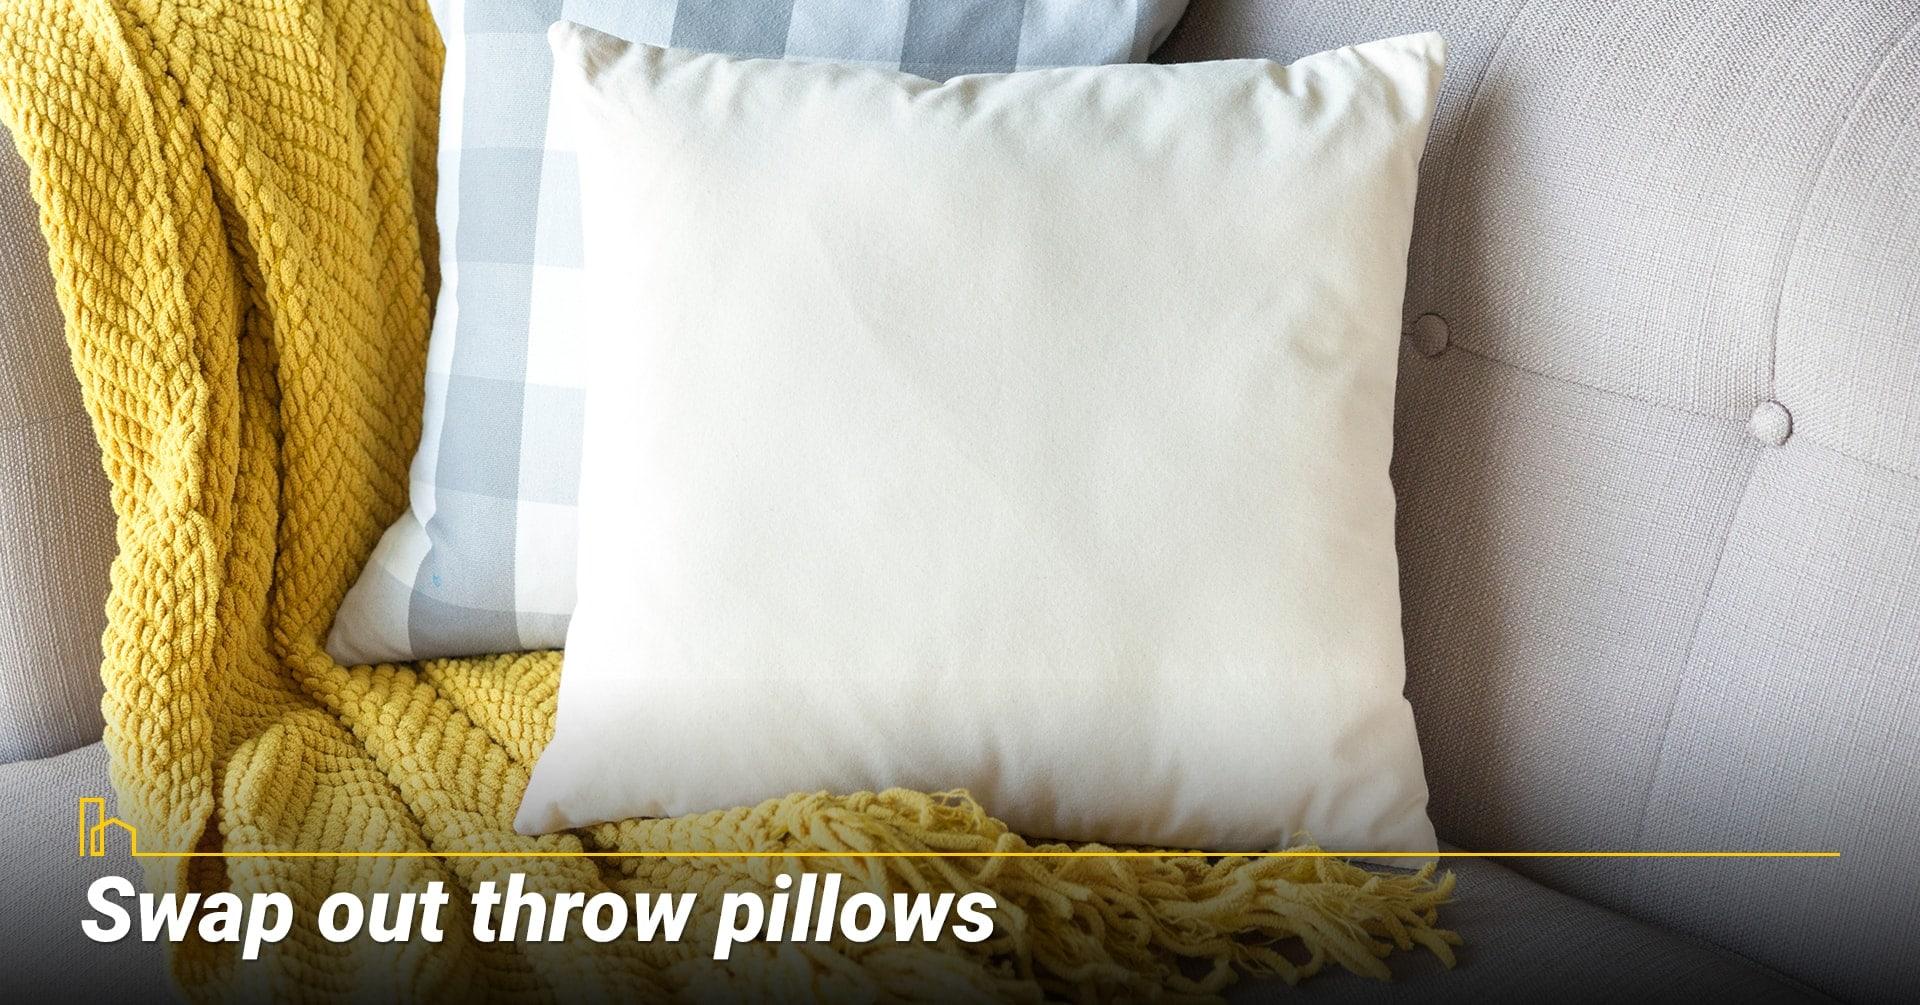 Swap out throw pillows, upgrade throws and pillows